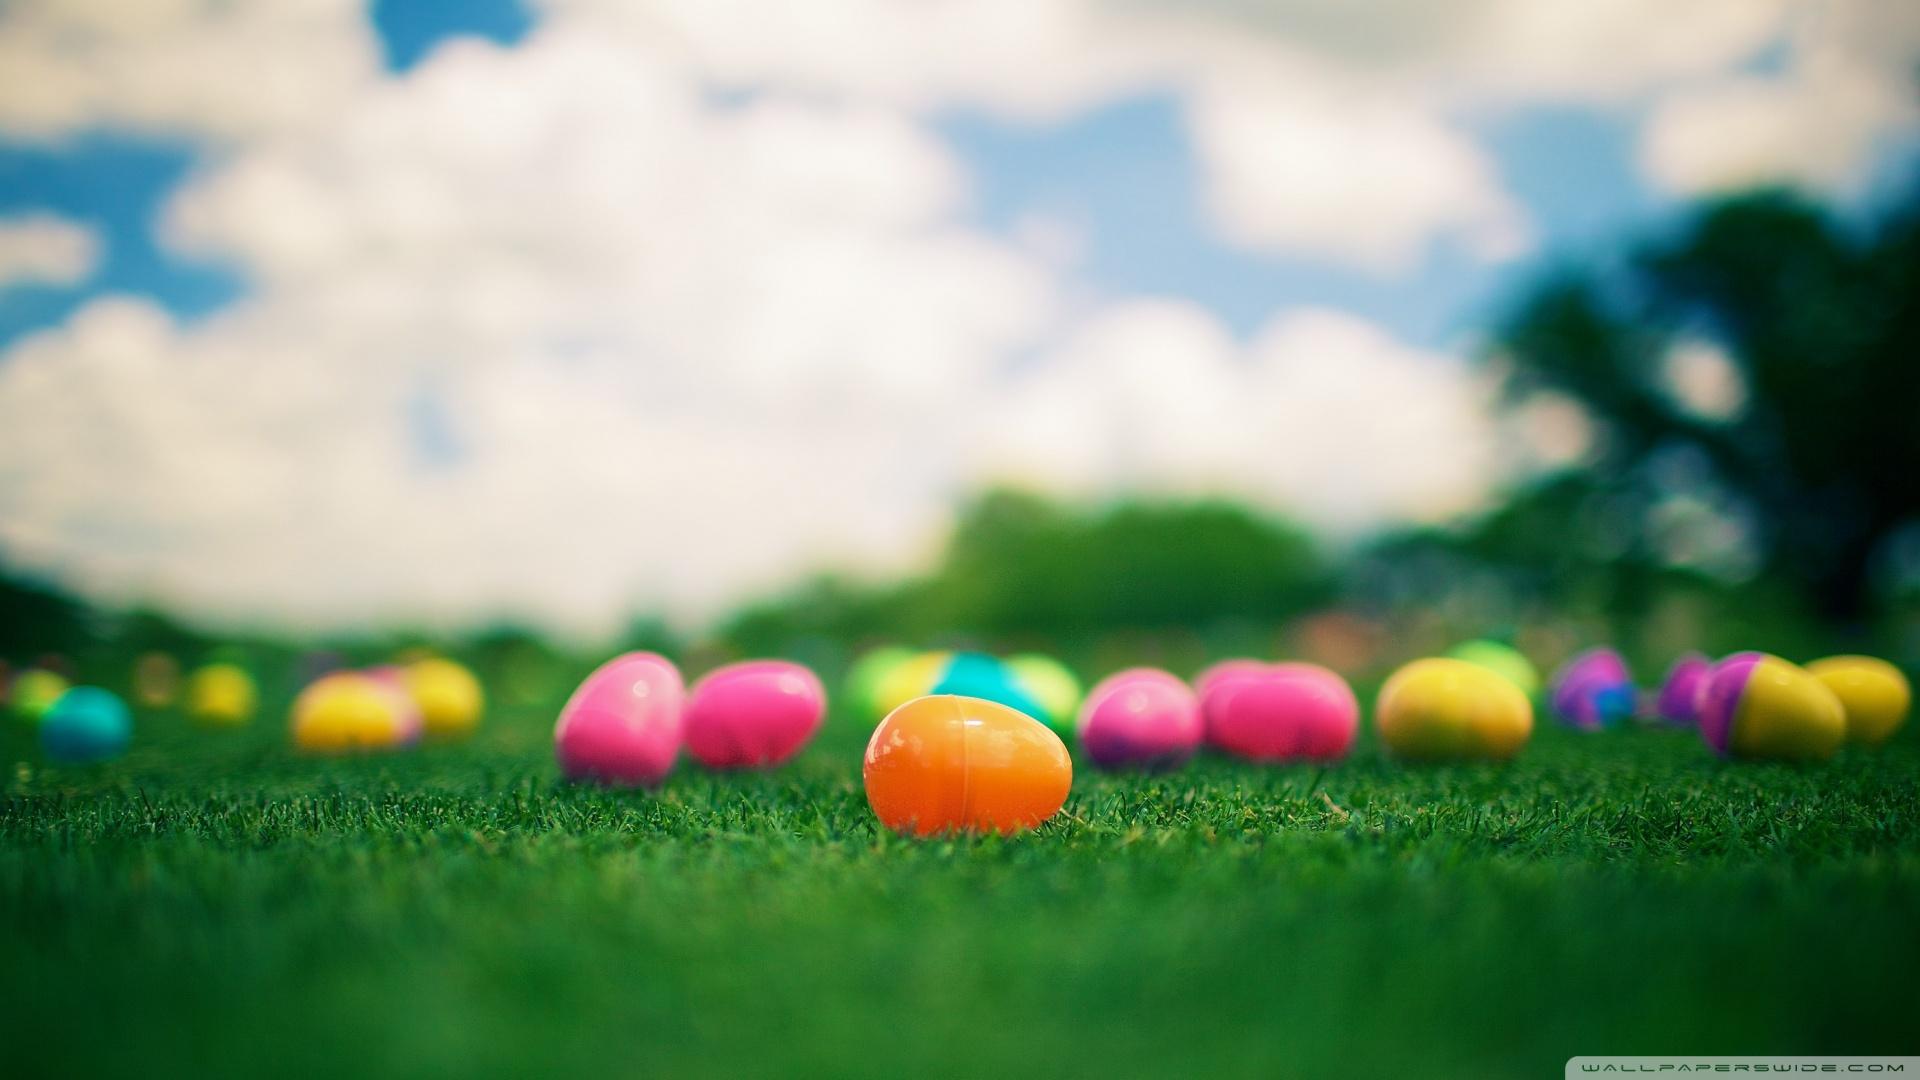 0 Wonderful Hd Easter Wallpapers Happy Easter Desktop   High 1920x1080